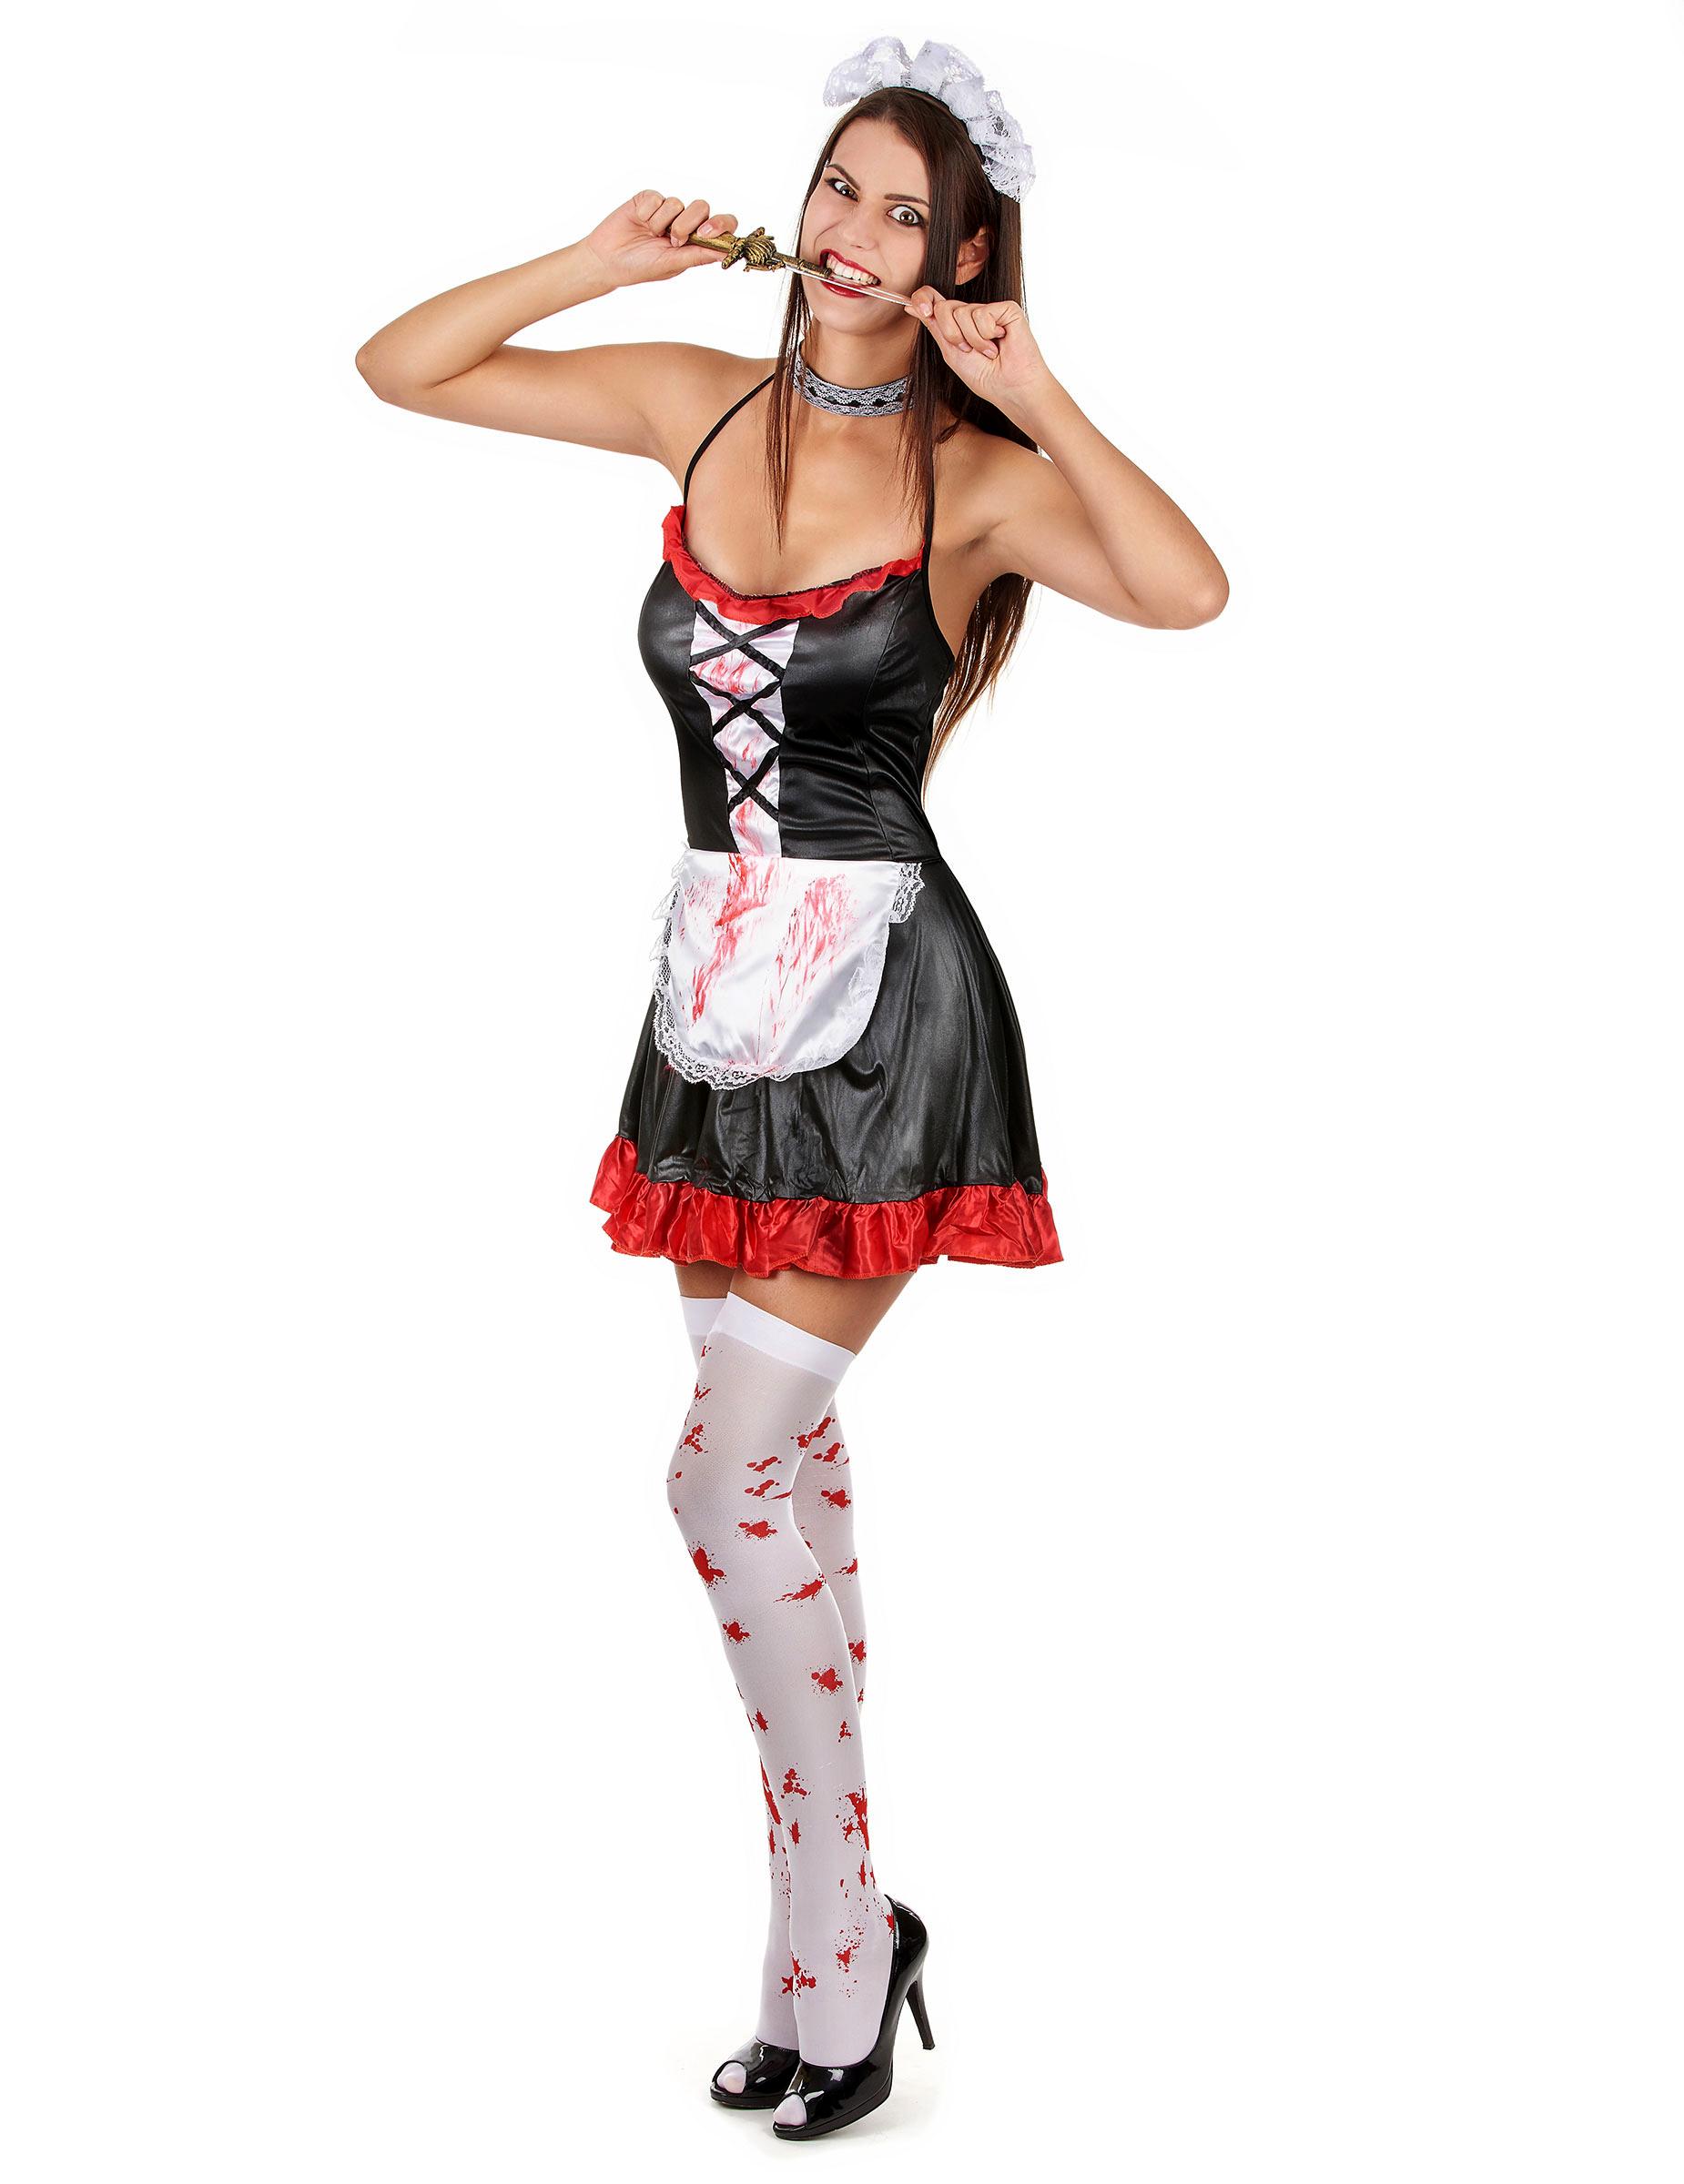 Halloween Kleding Dames.Verkleedkostuum Bebloed Kamermeisje Voor Dames Halloween Kleding